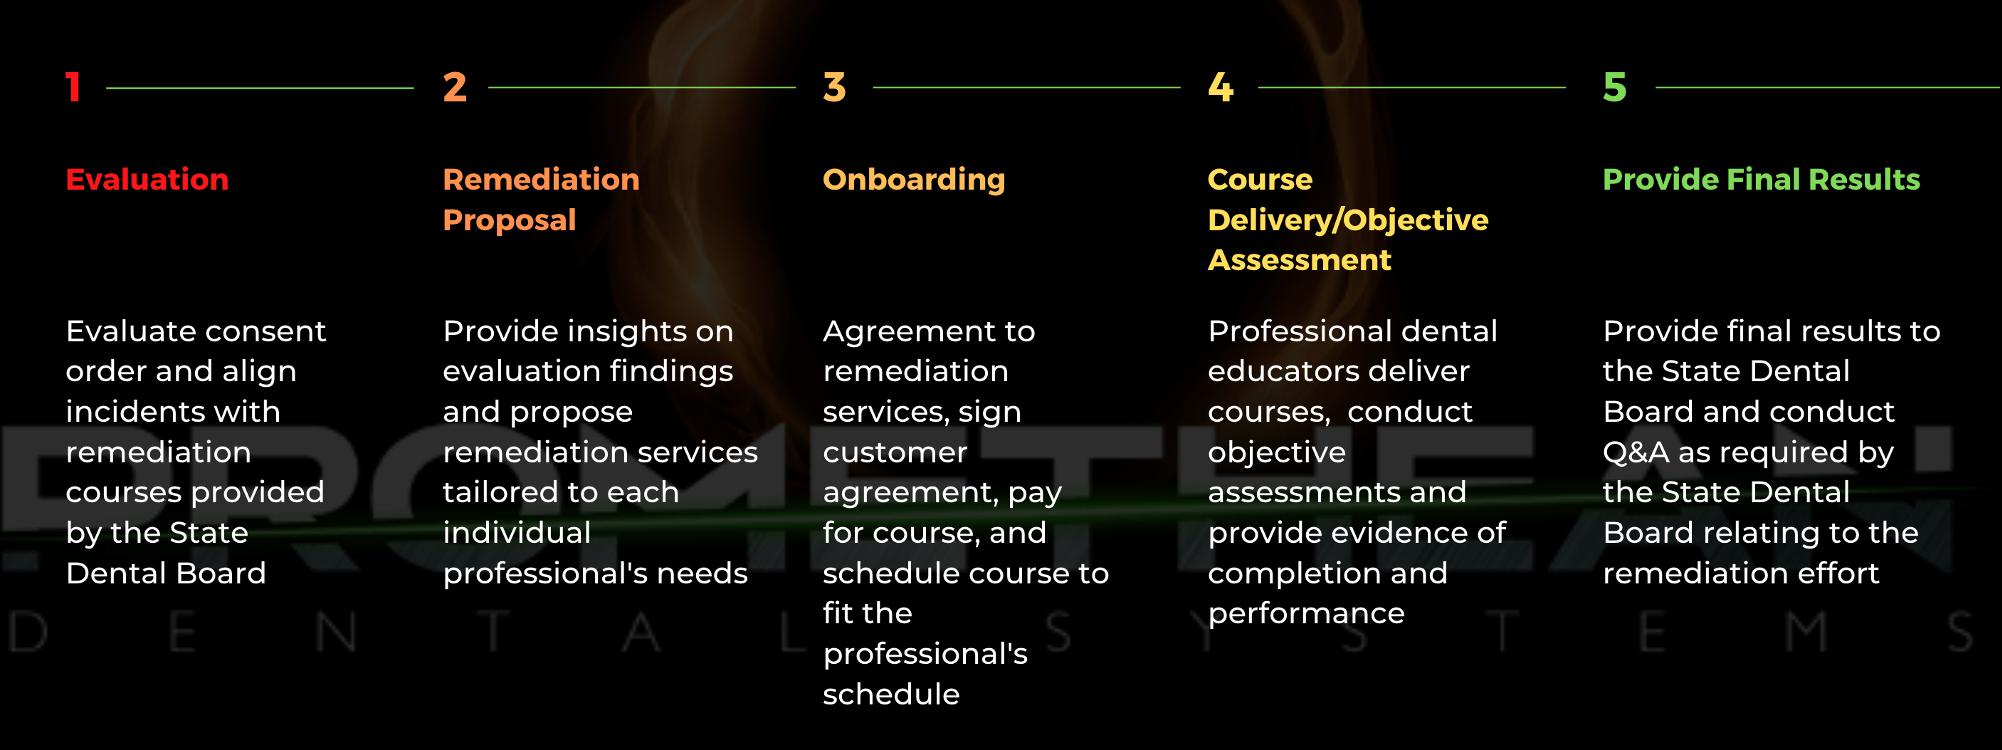 5 Step Remediation Process